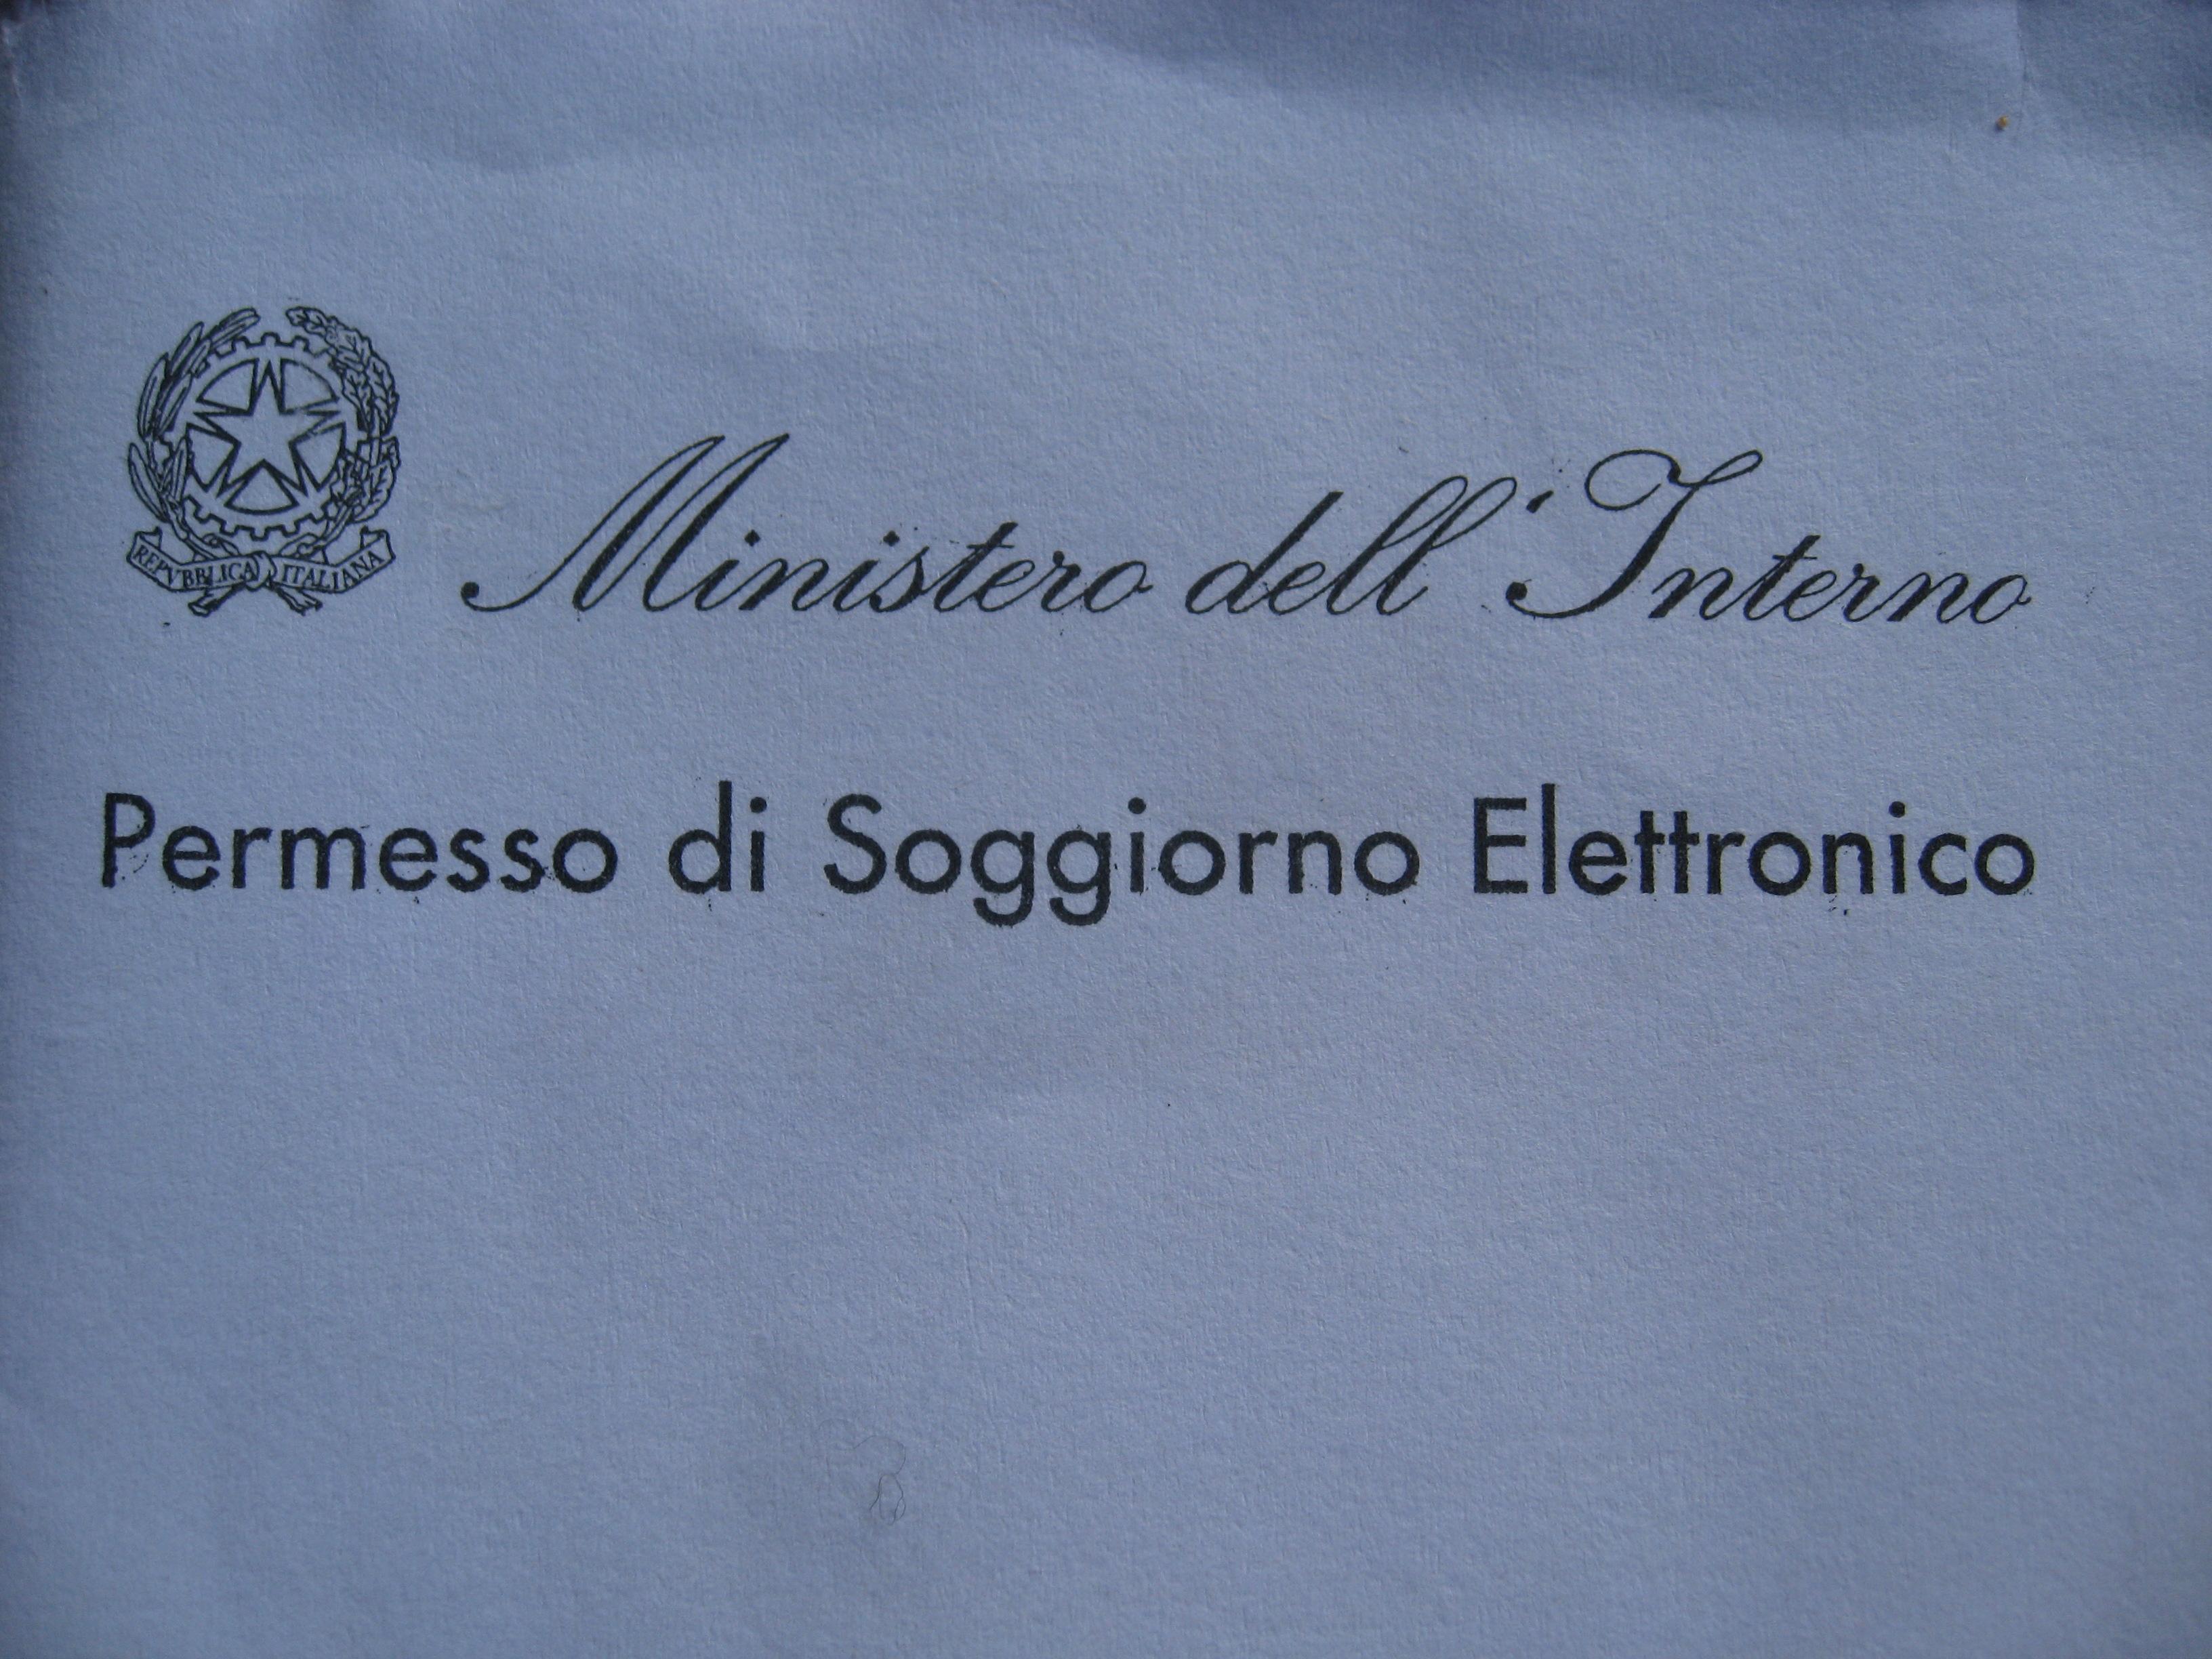 Permesso di Soggiorno – Working Holiday visas | Tali Goes Travelling